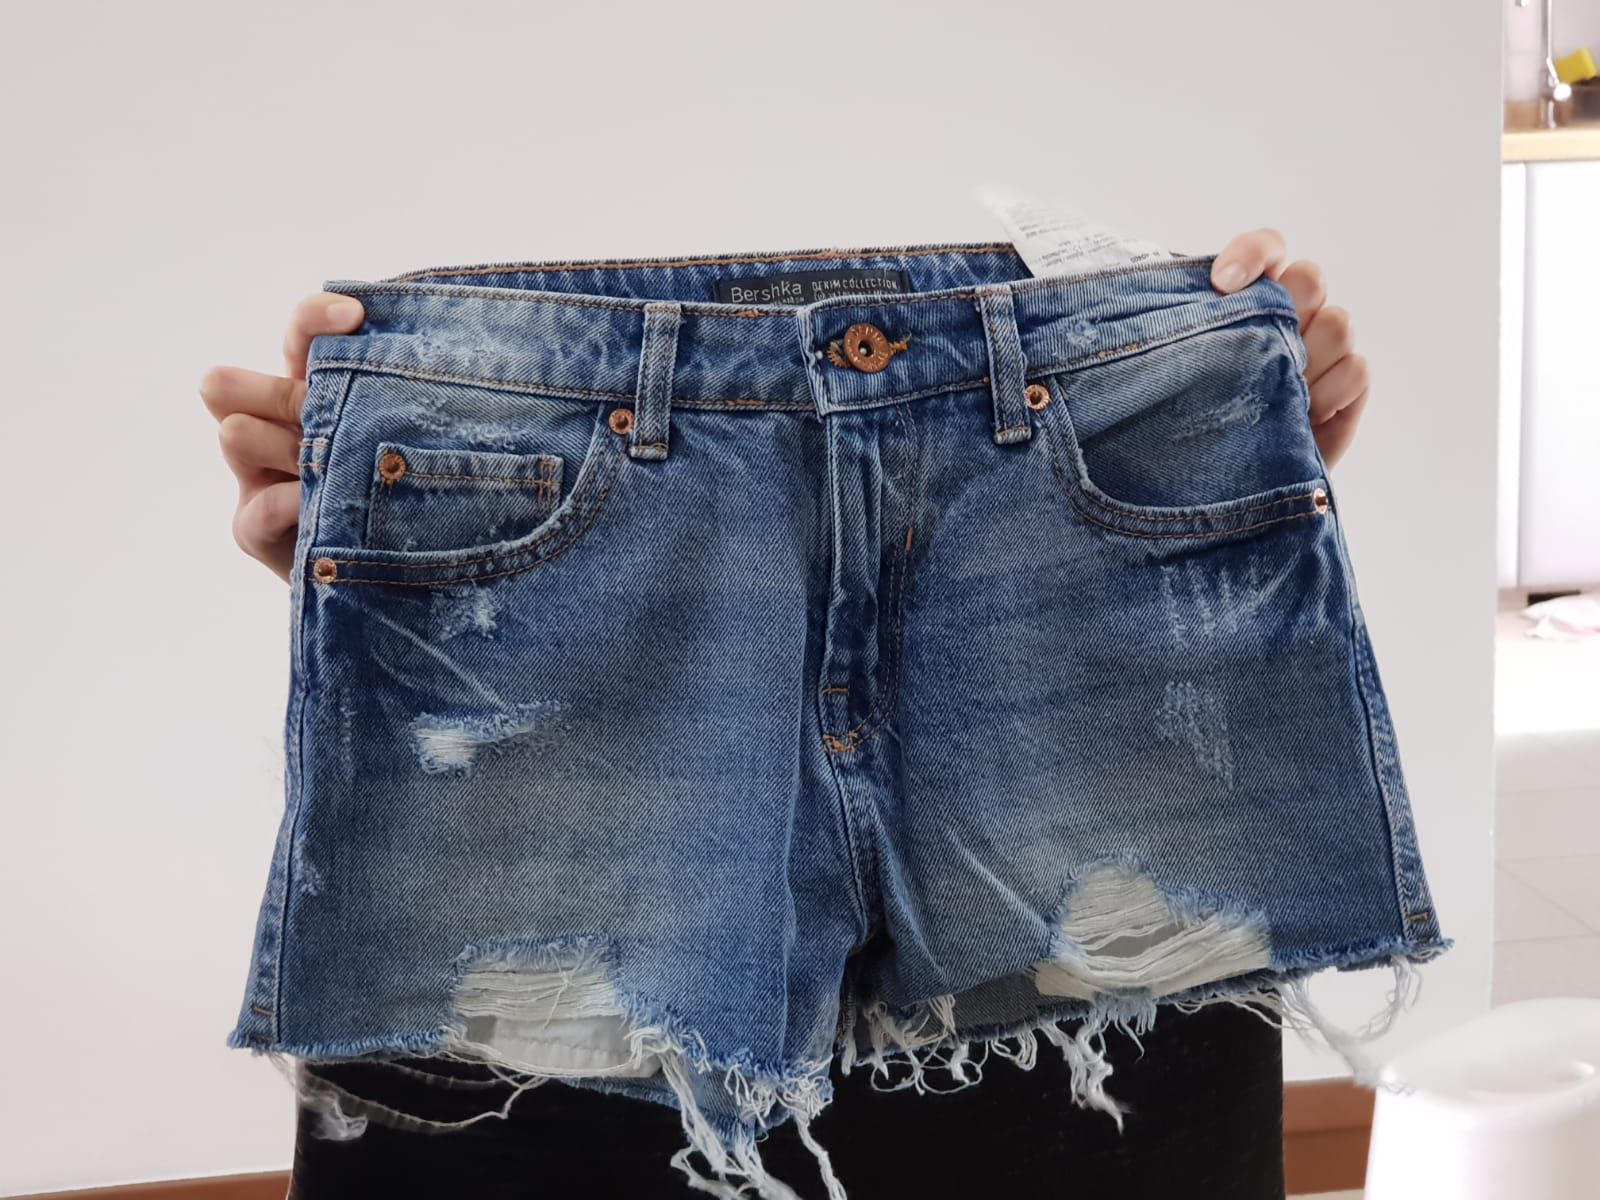 67da83c1b310b Bershka Denim shorts, Women's Fashion, Clothes, Pants, Jeans ...